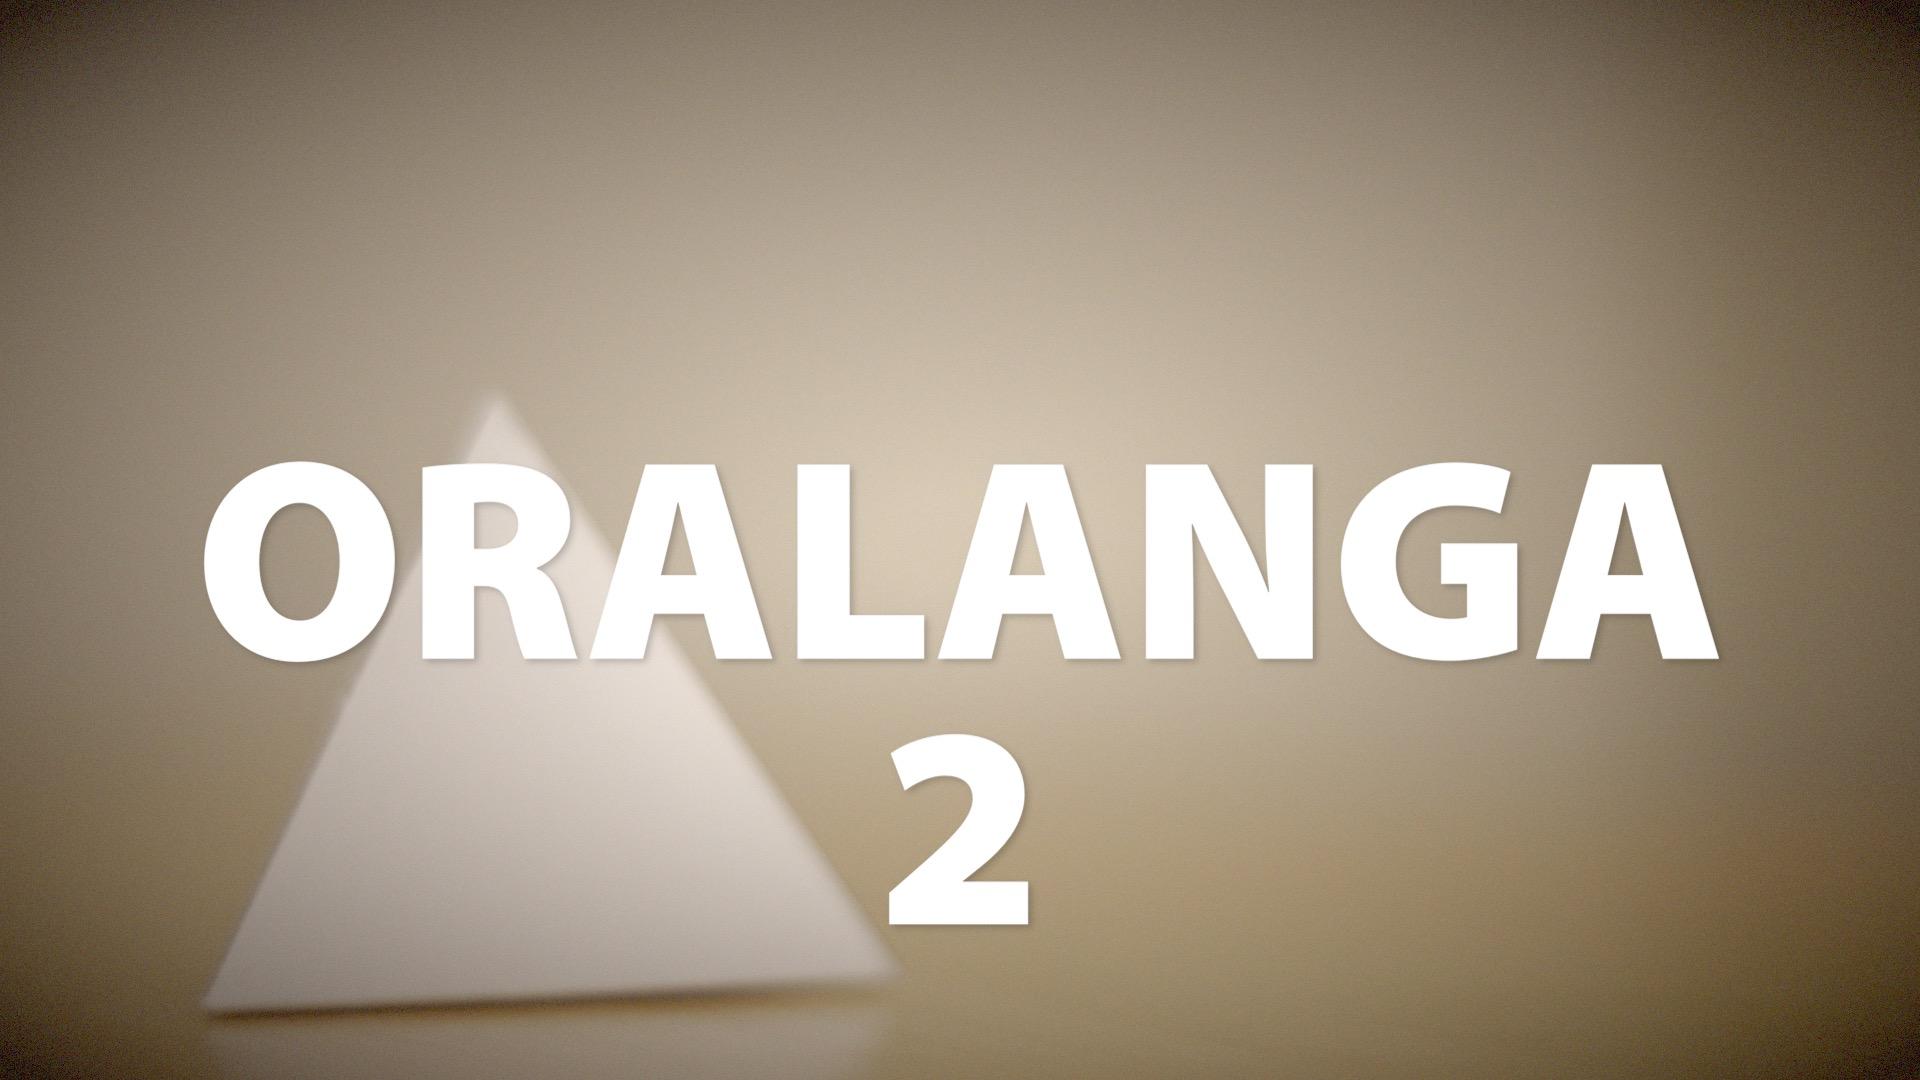 Oralanga 2